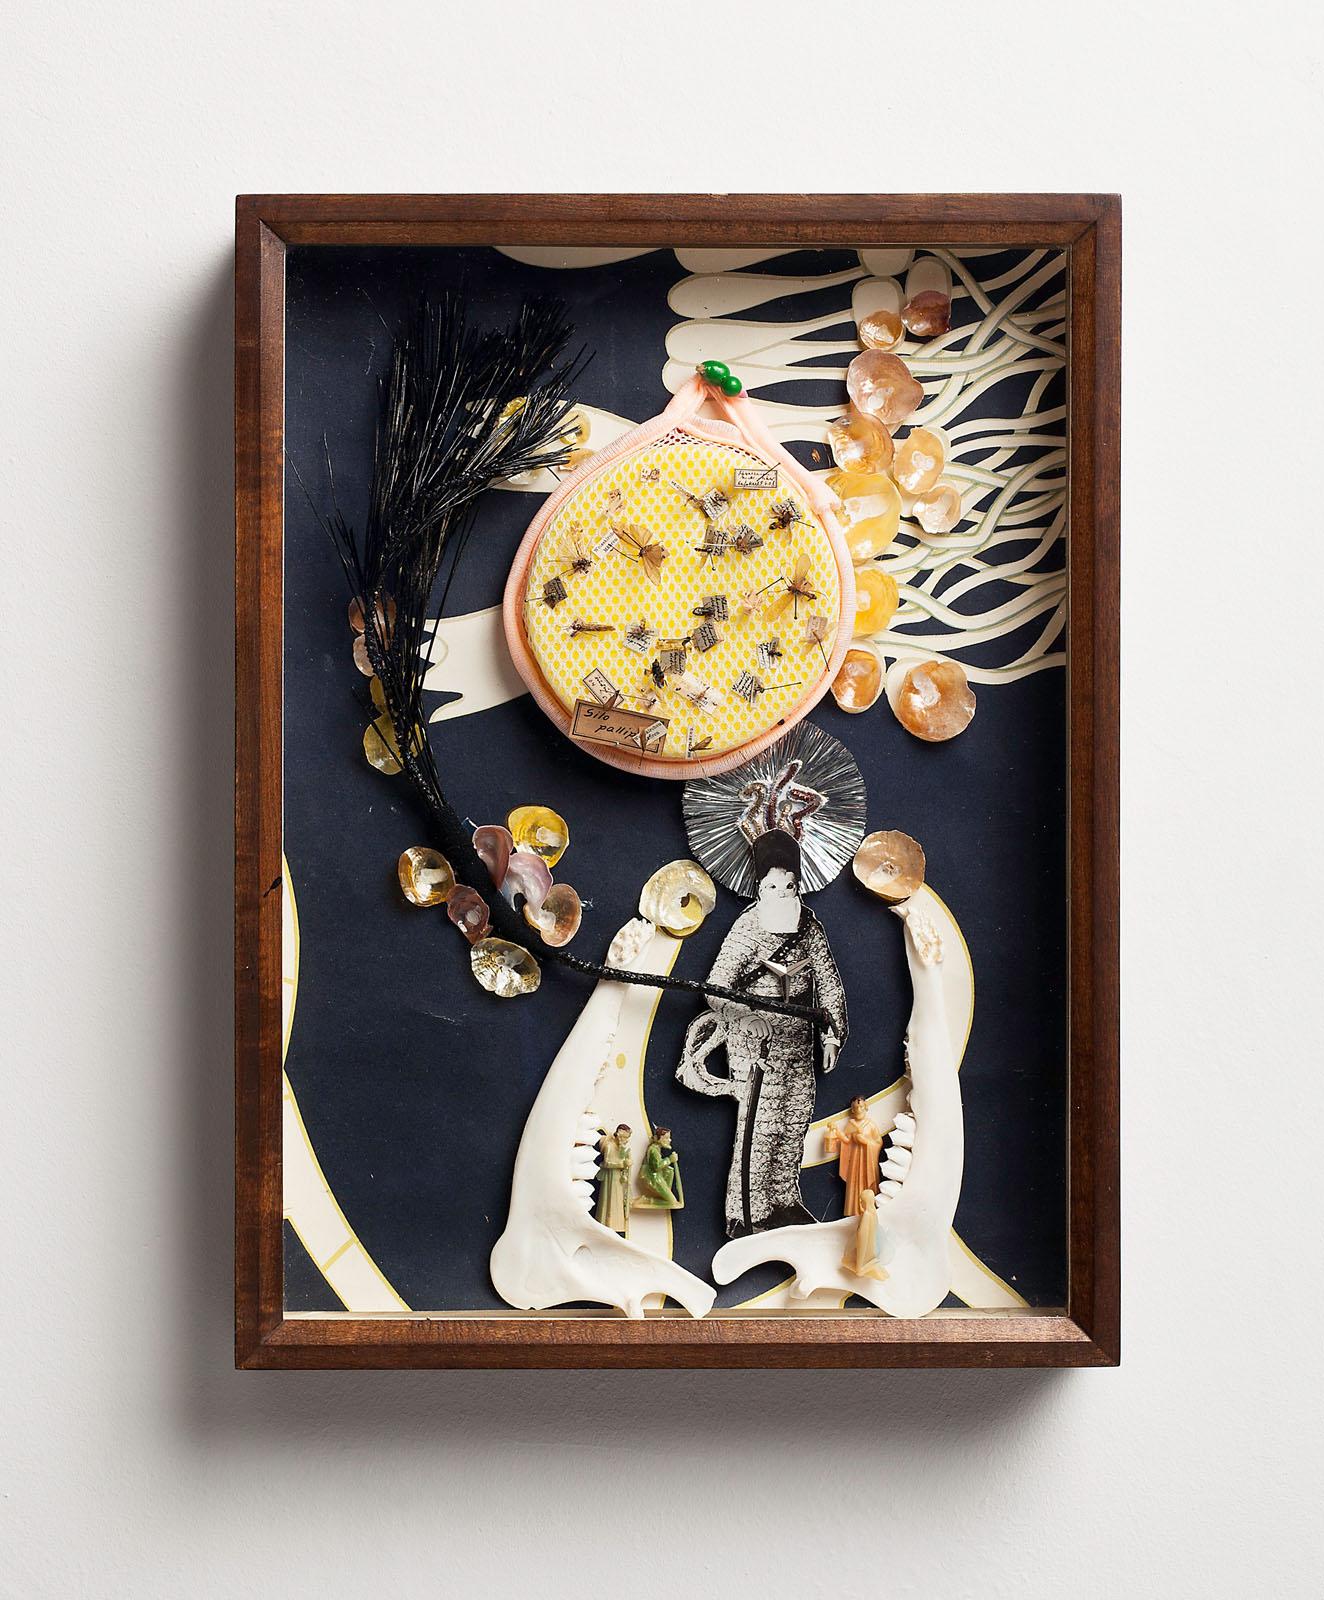 "o.T. aus ""Petrichor – Alpis"", 2016, 39,8 x 30 x 6,5 cm, diverse Materialien in Schaukasten"